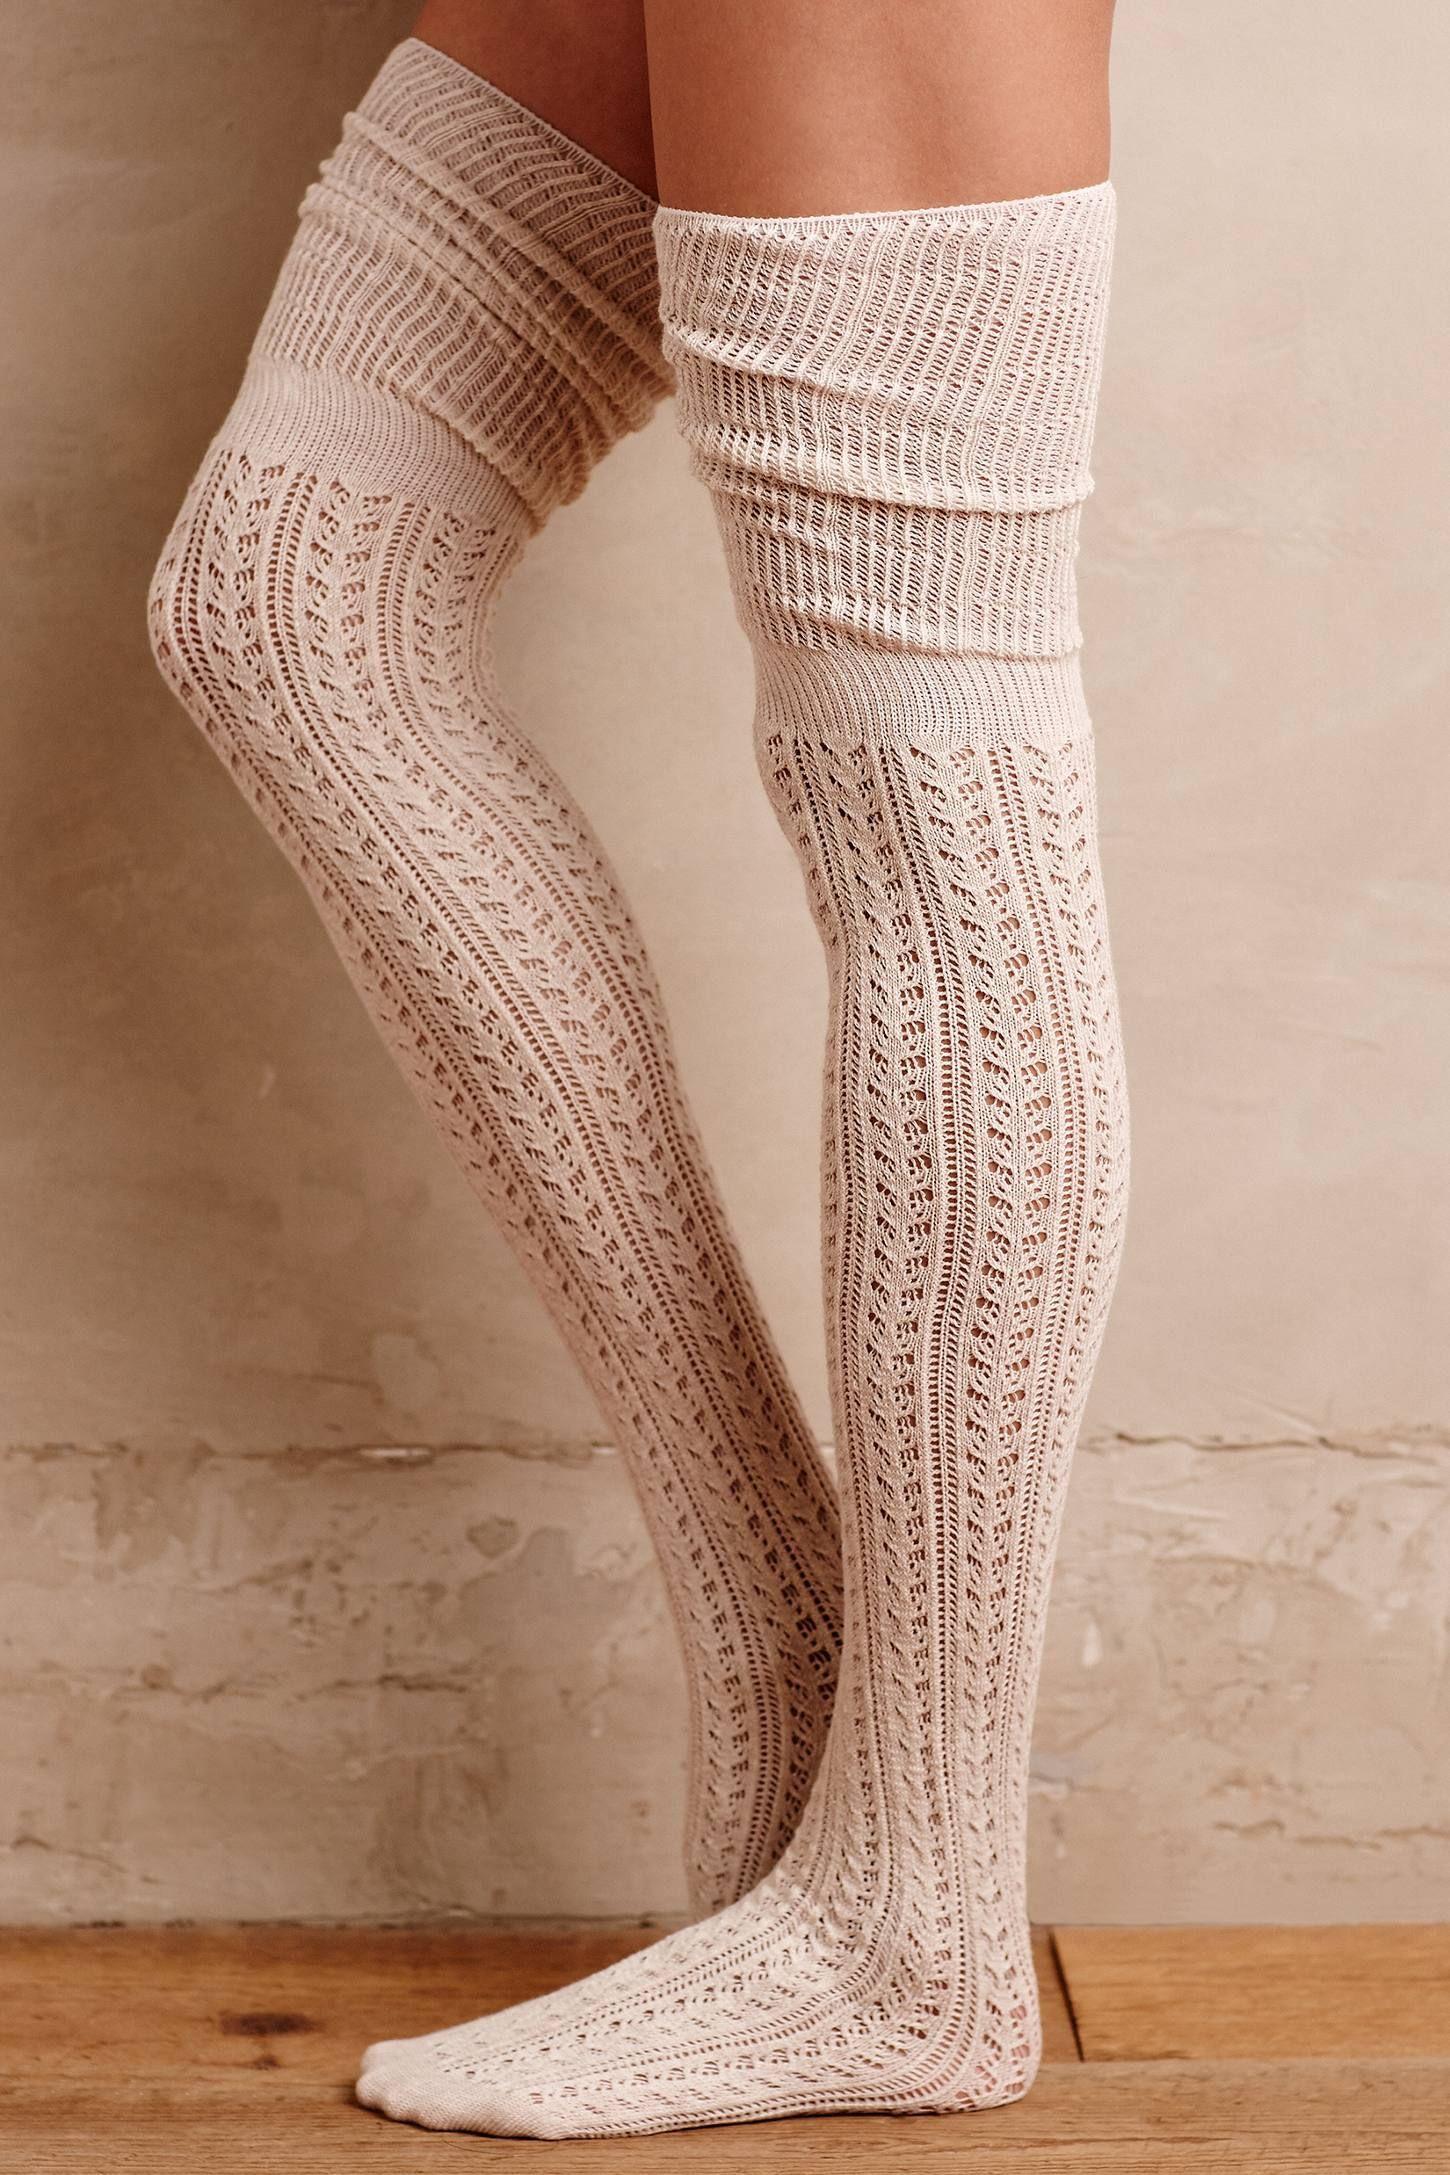 1bc54f899 Anthropologie s New Arrivals  Leg Warmers   Socks